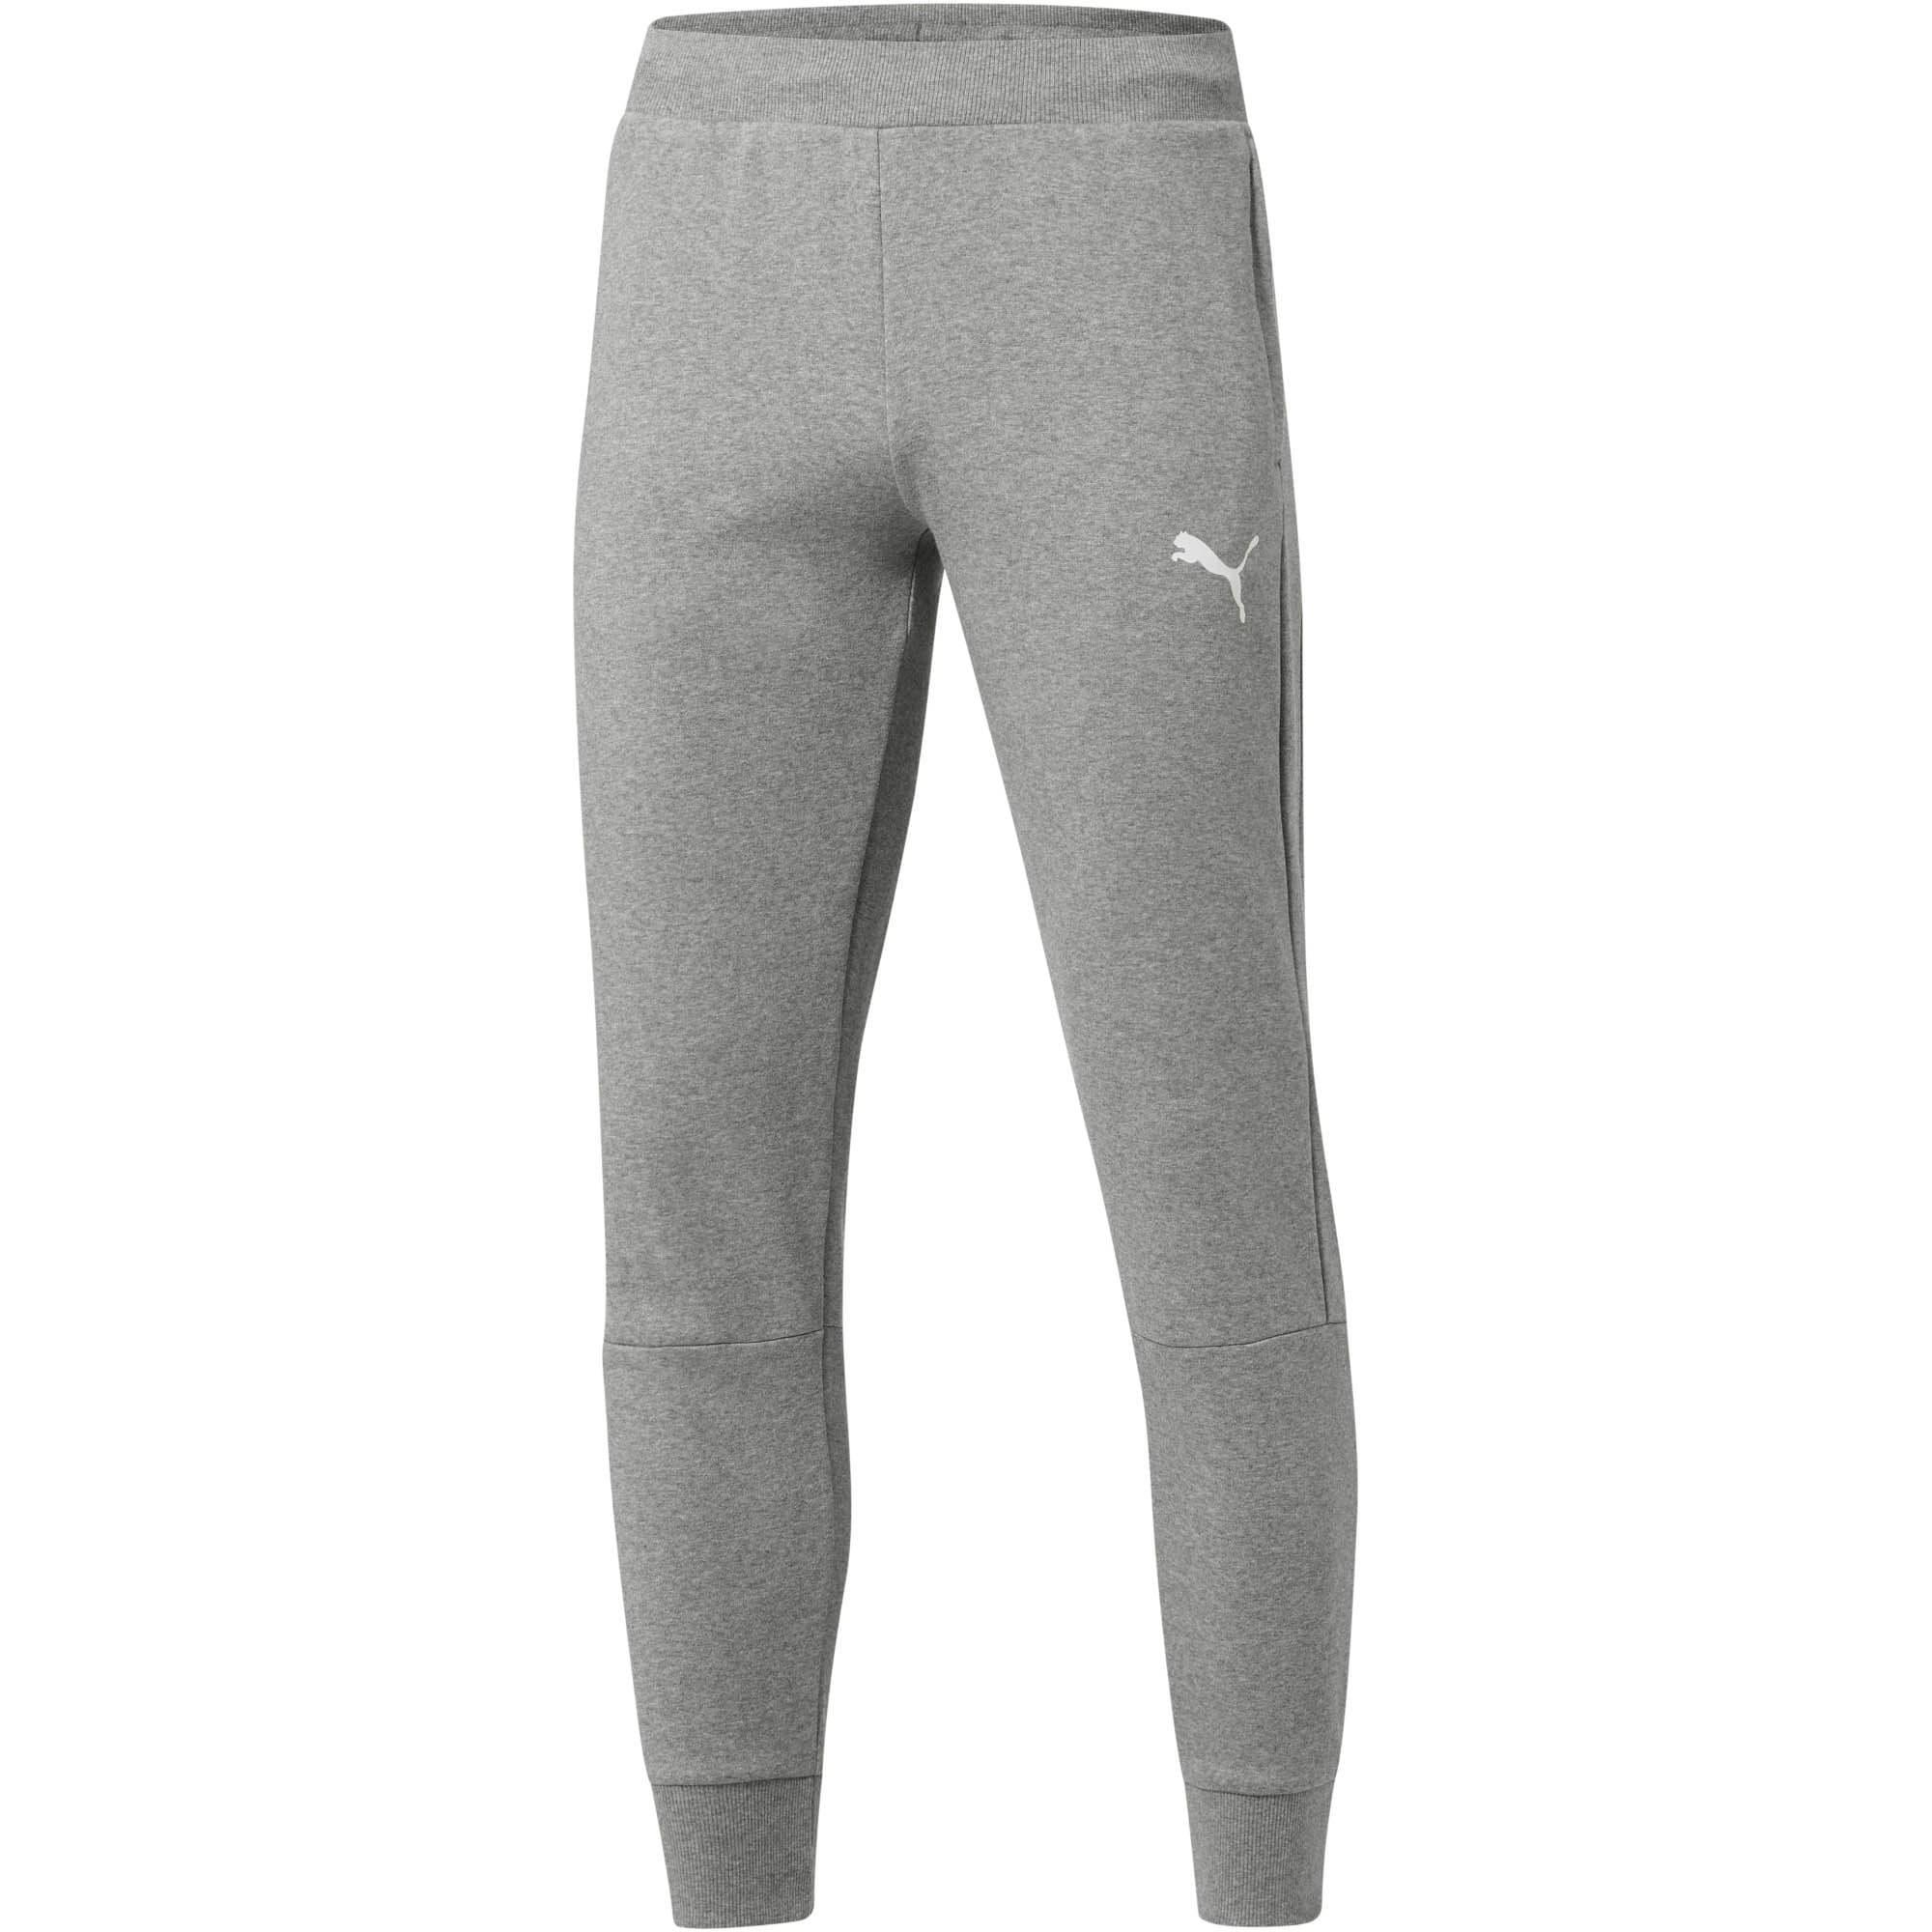 Thumbnail 1 of Modern Sports Fleece Pants, Medium Gray Heather, medium